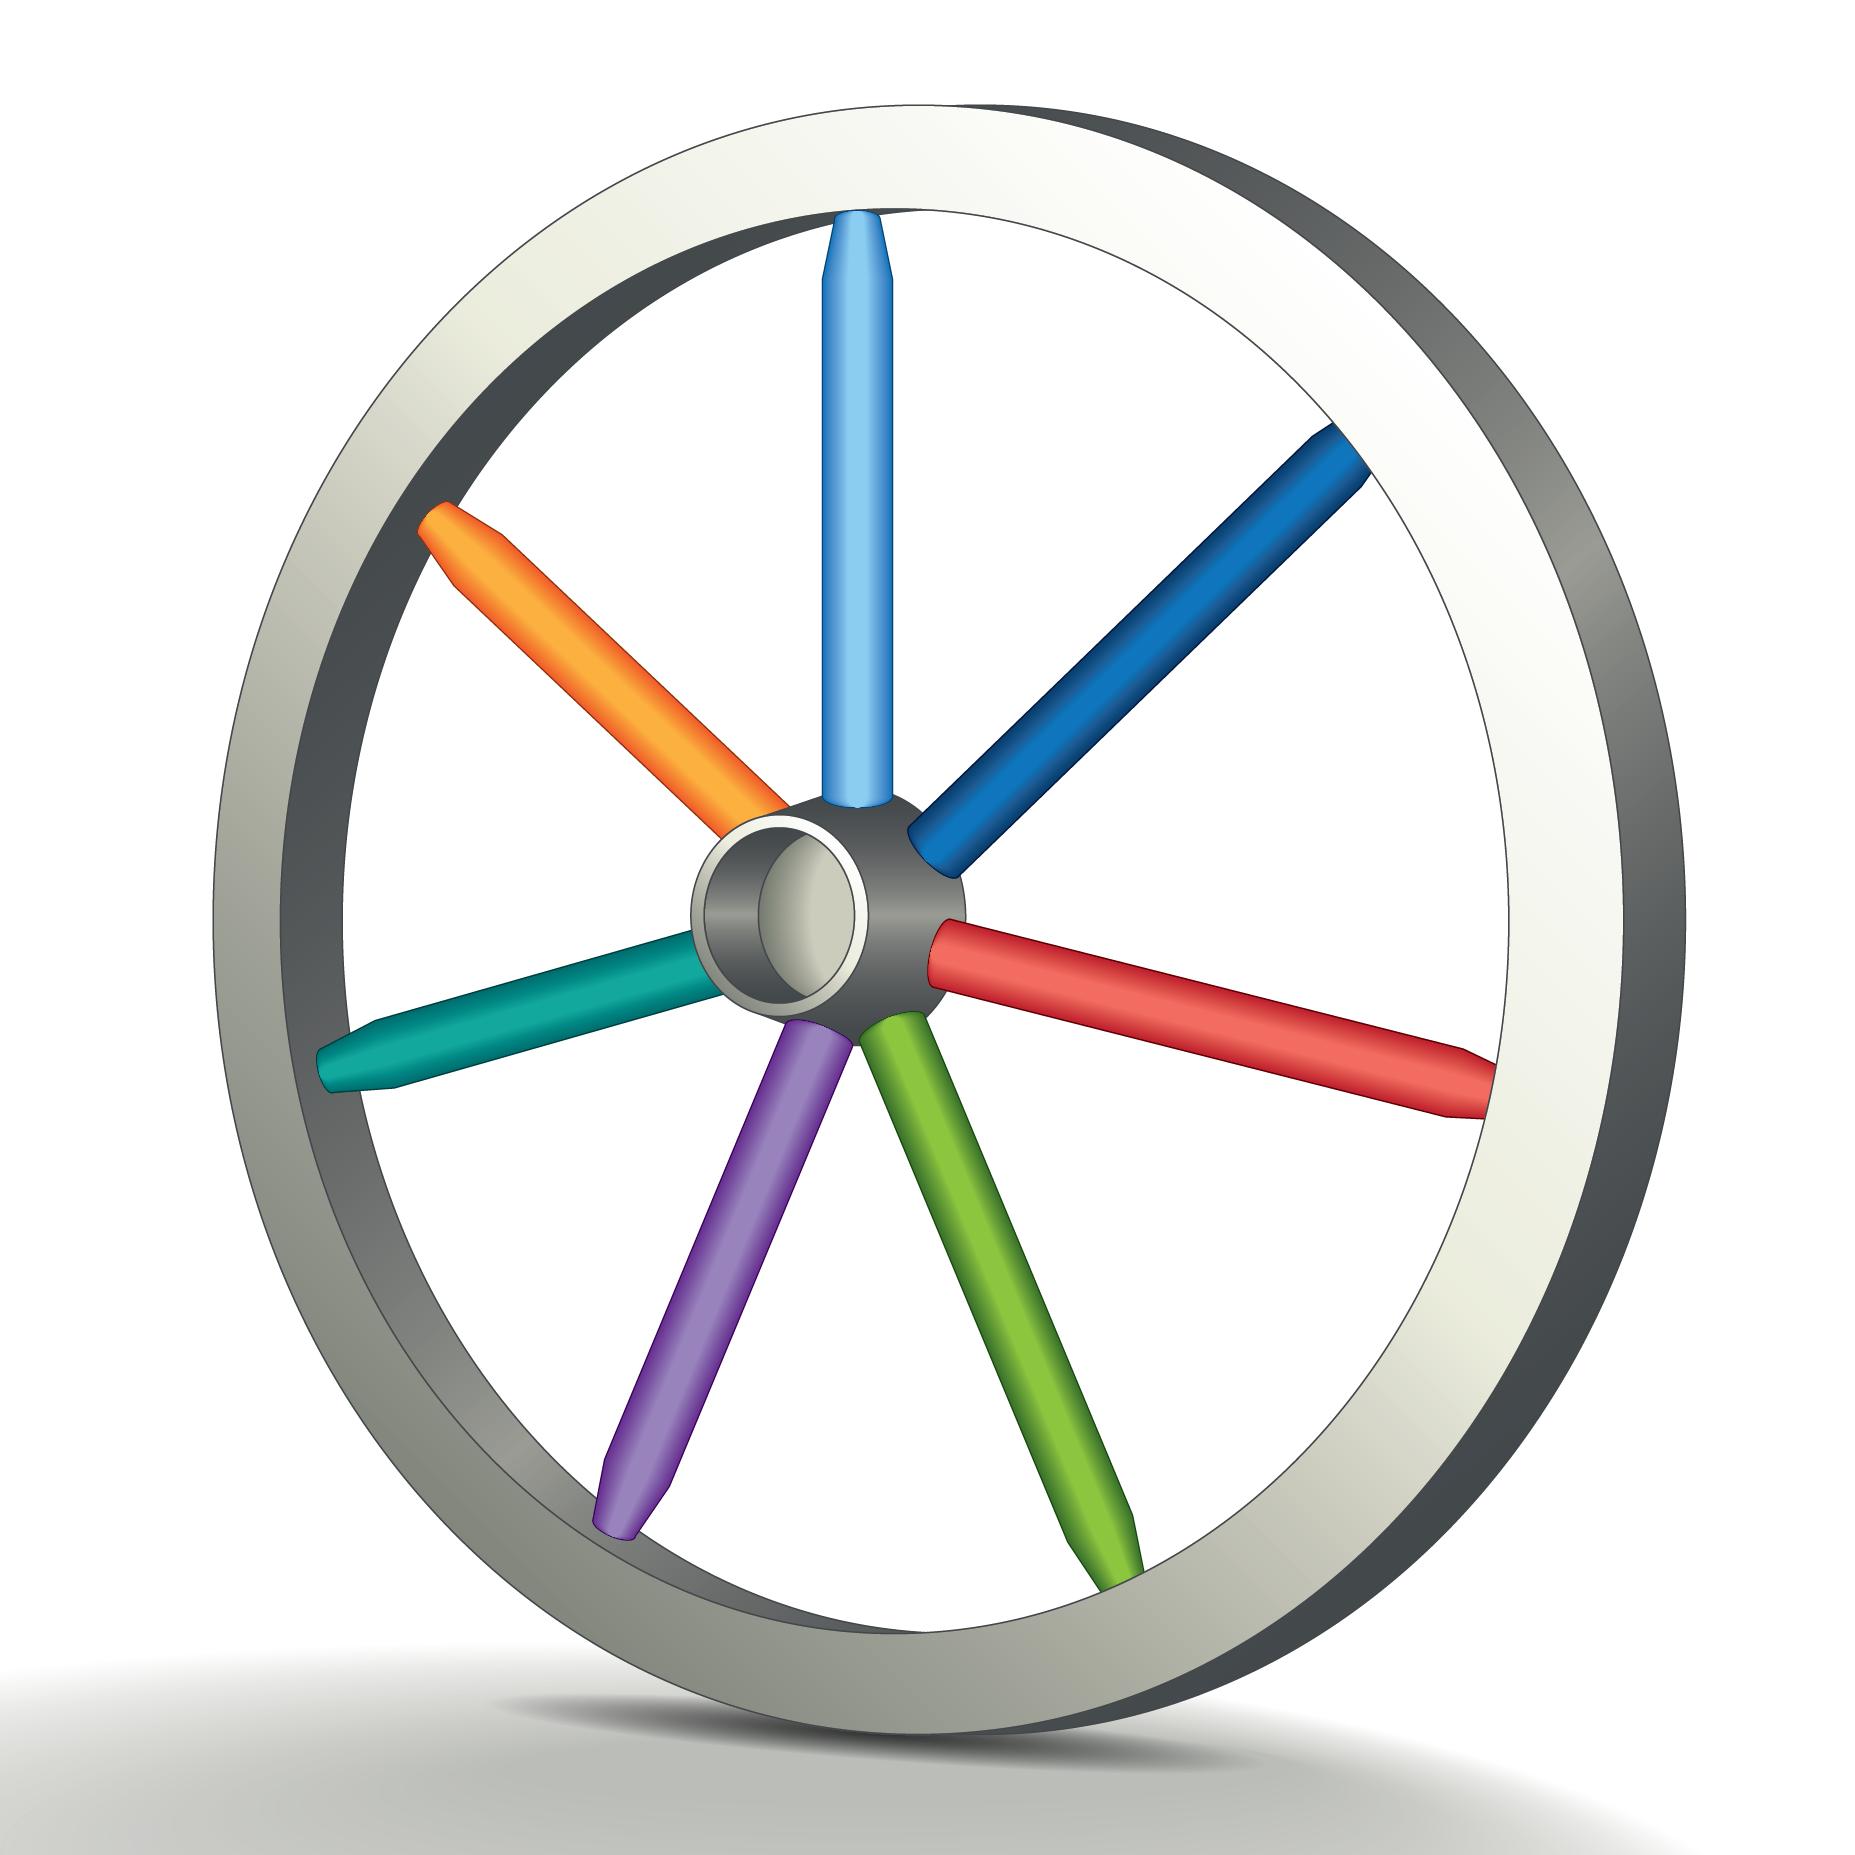 Wheel HD wallpapers, Desktop wallpaper - most viewed